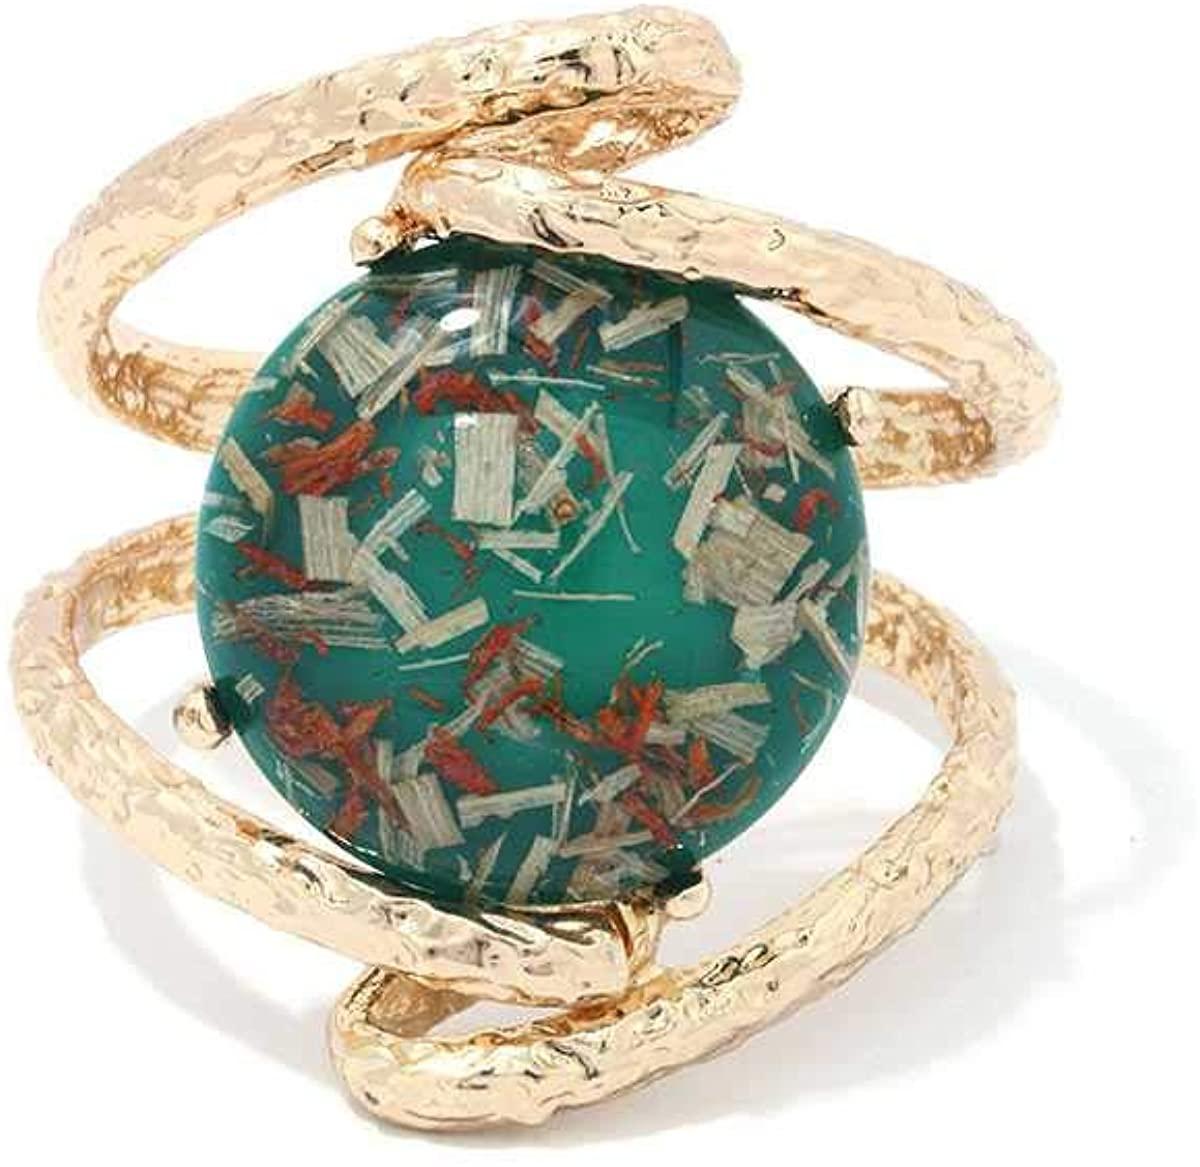 Shop & Buy Round Metal Cuff Bracelet